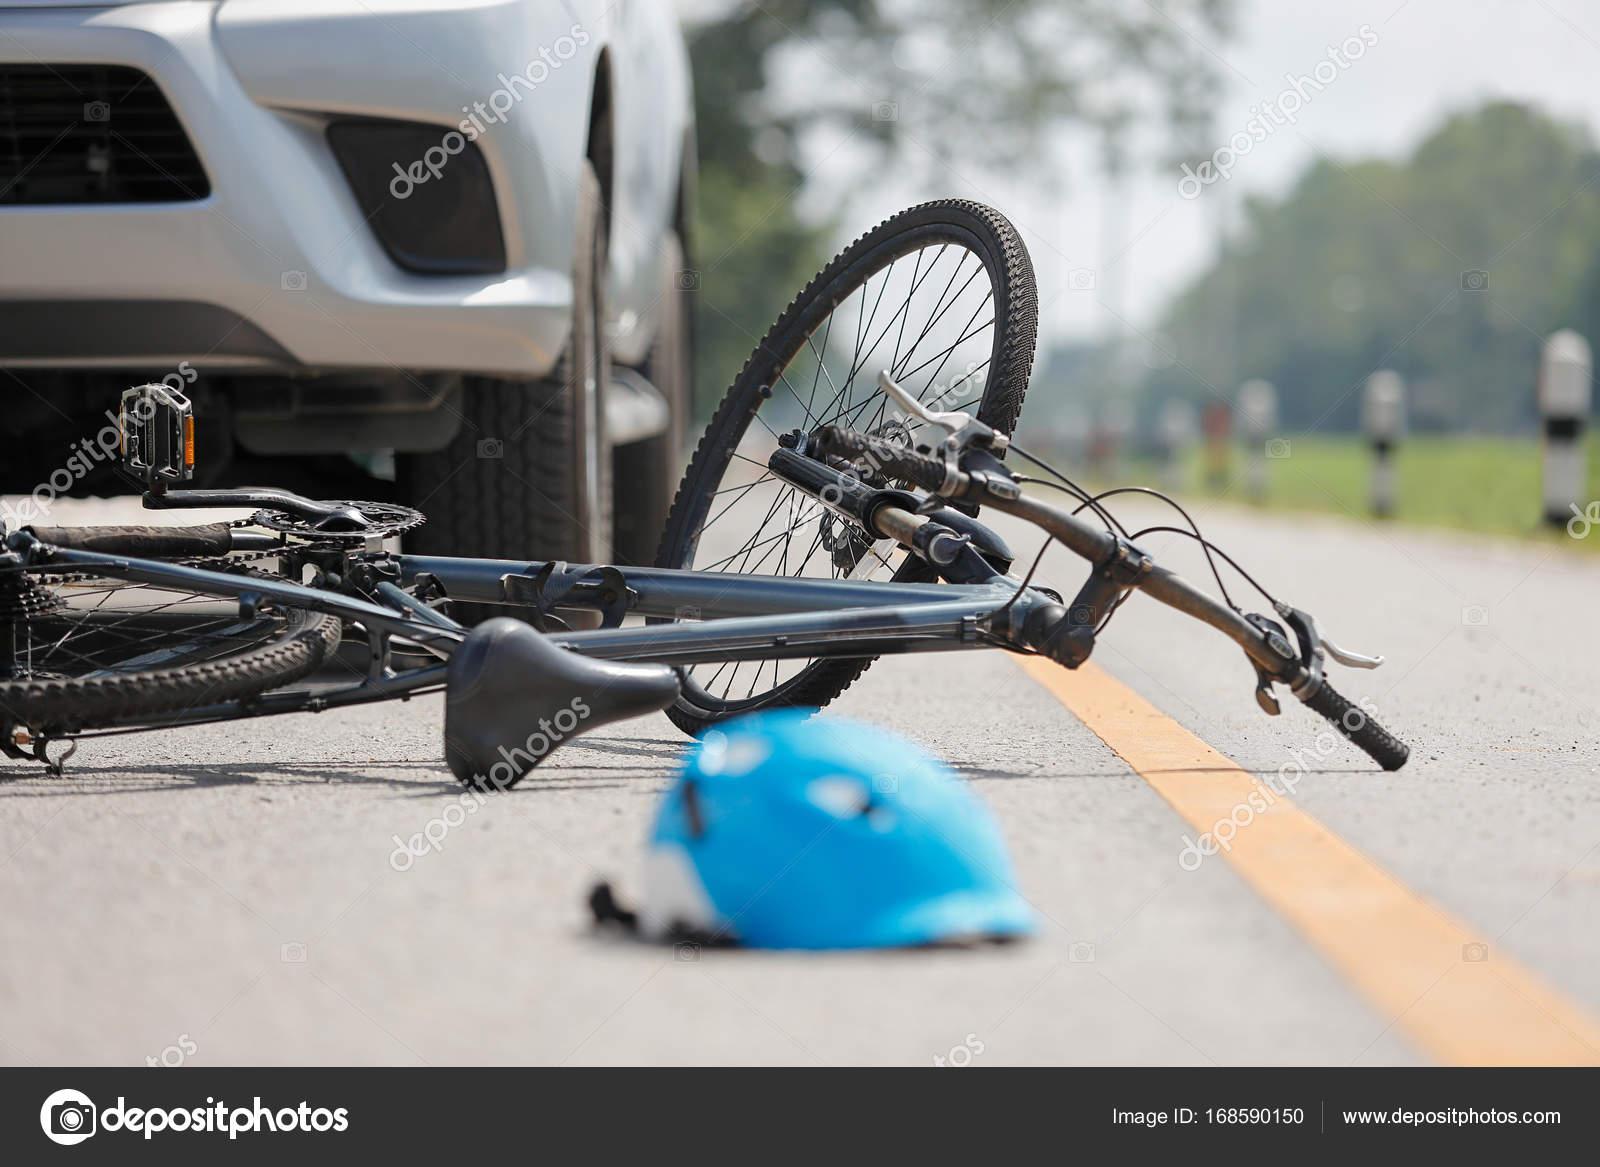 Unfall Auto Crash mit dem Fahrrad unterwegs — Stockfoto © toa55 ...